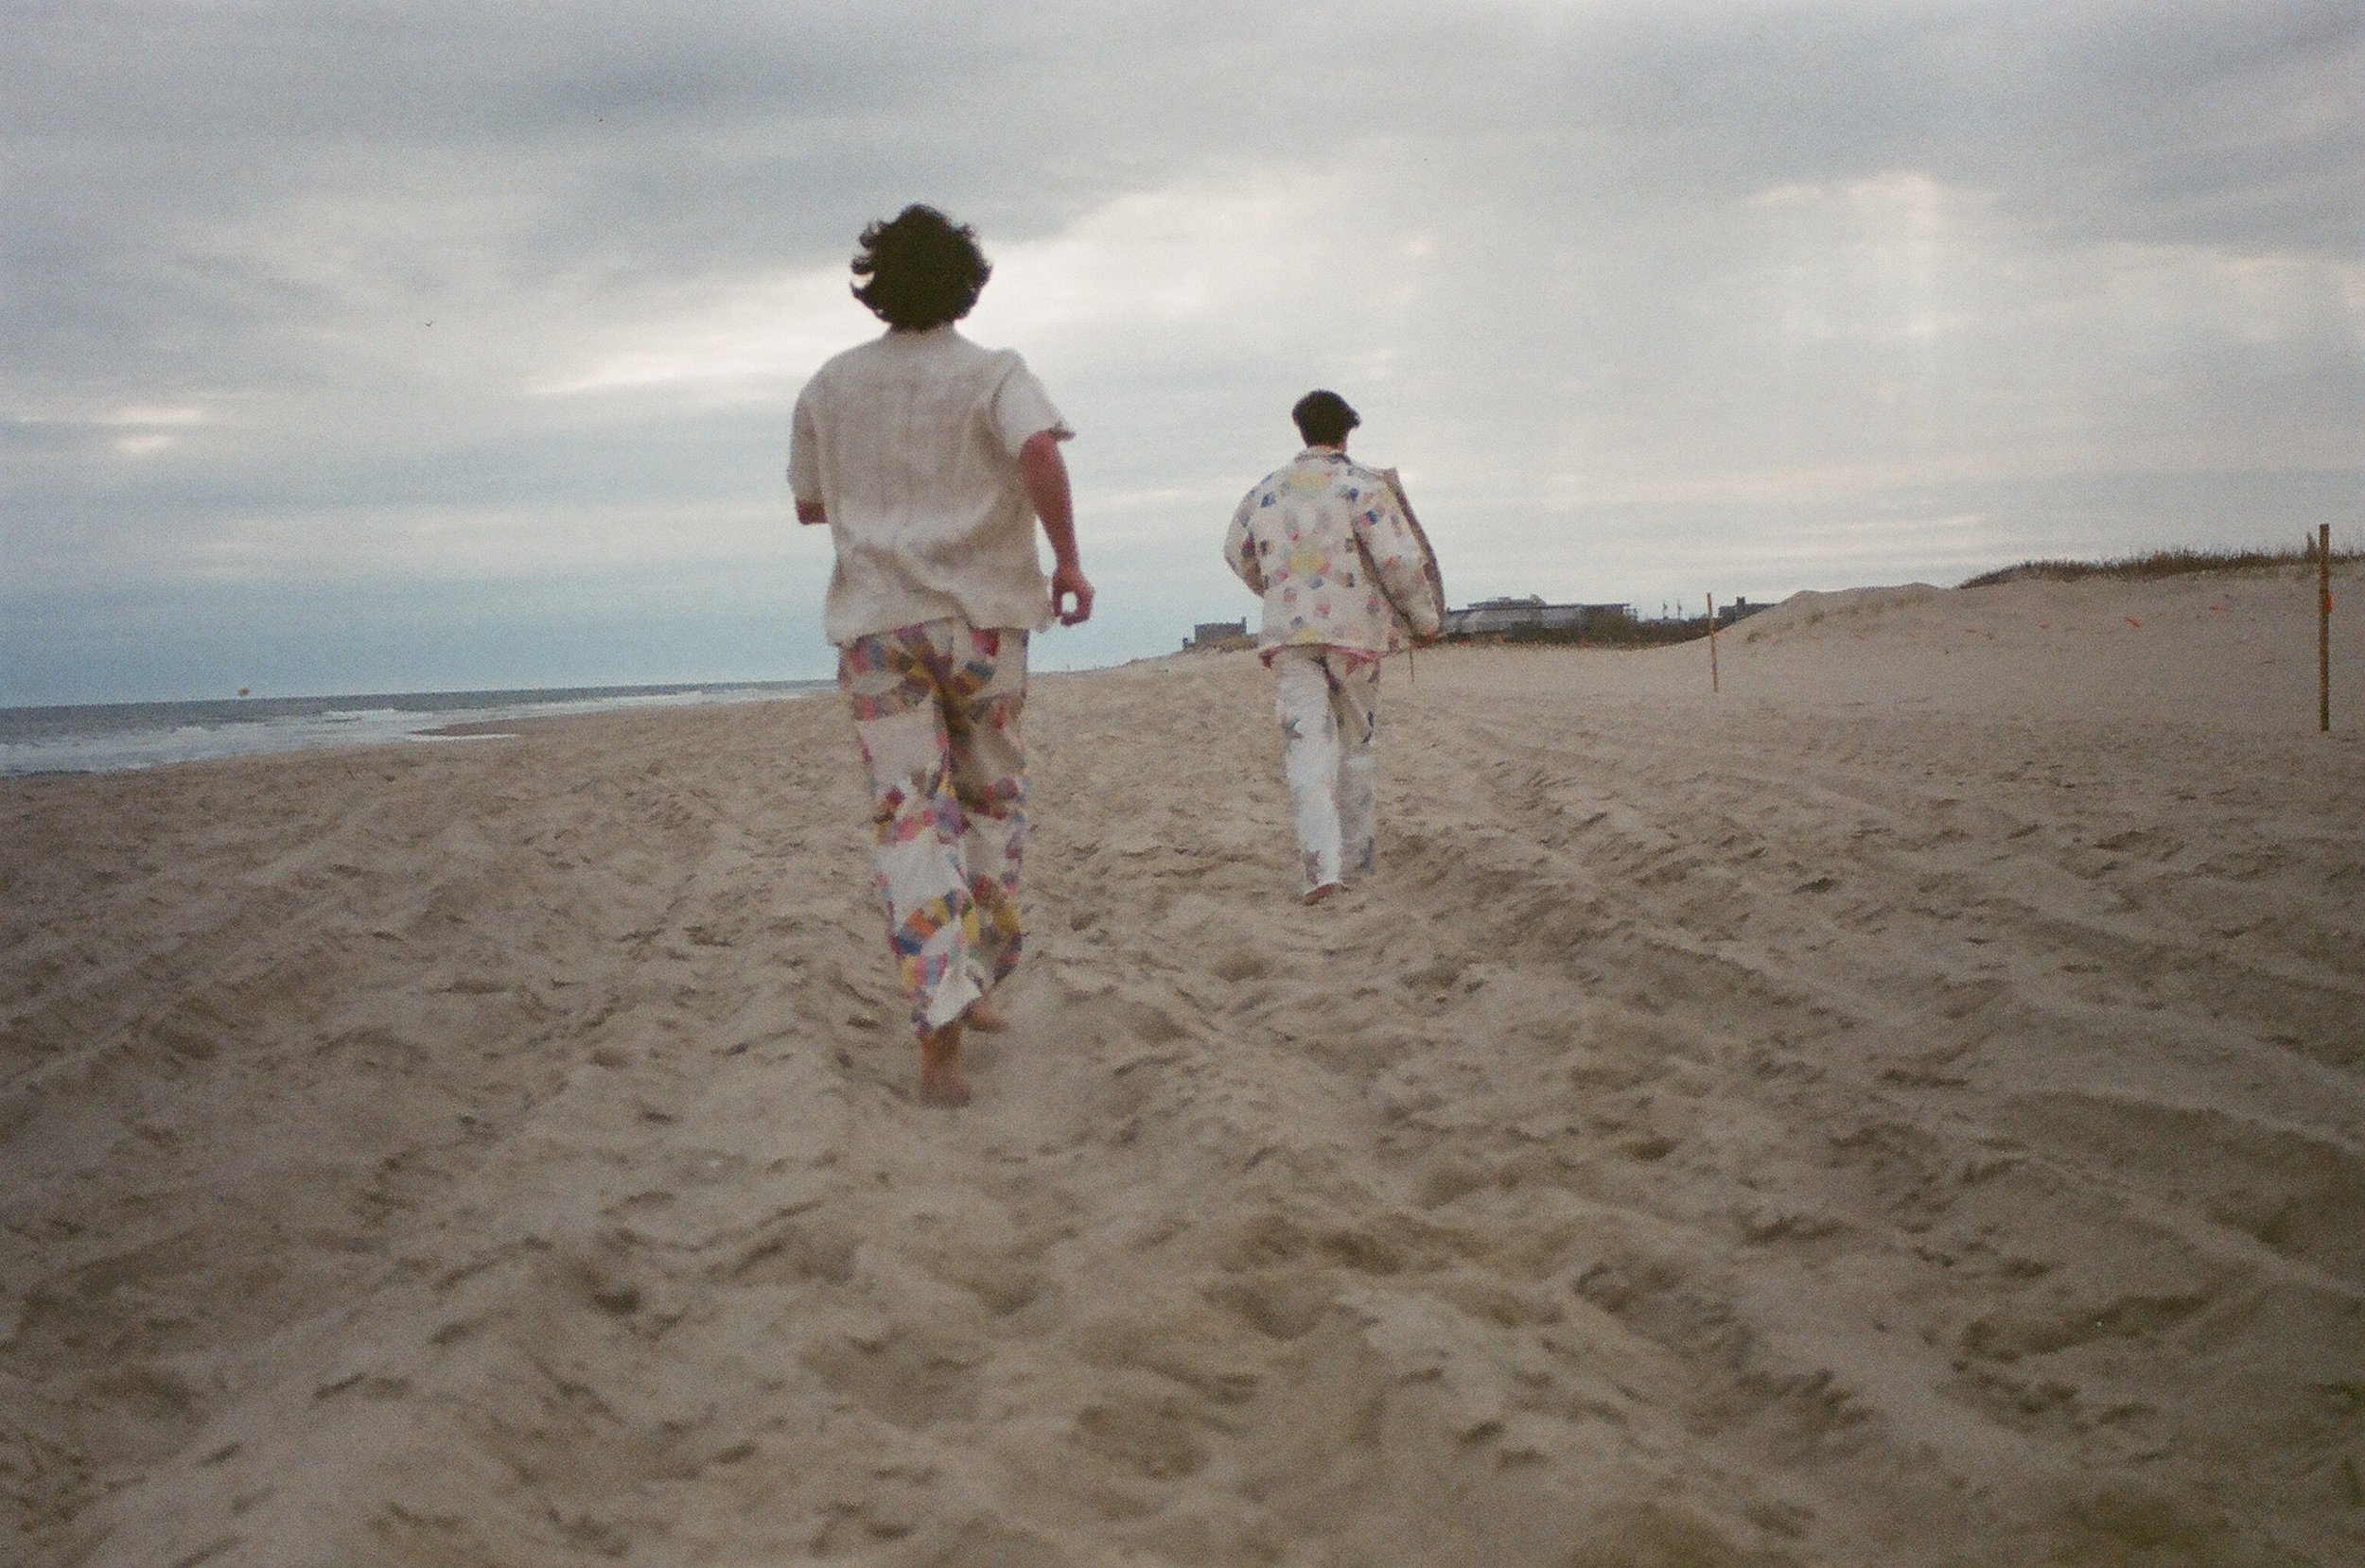 Chelsy-Mitchel-photographer-bode-nyc-fashion-beach-editorial-beachside-car-christian-matthew-rice-beach-fashion.JPG